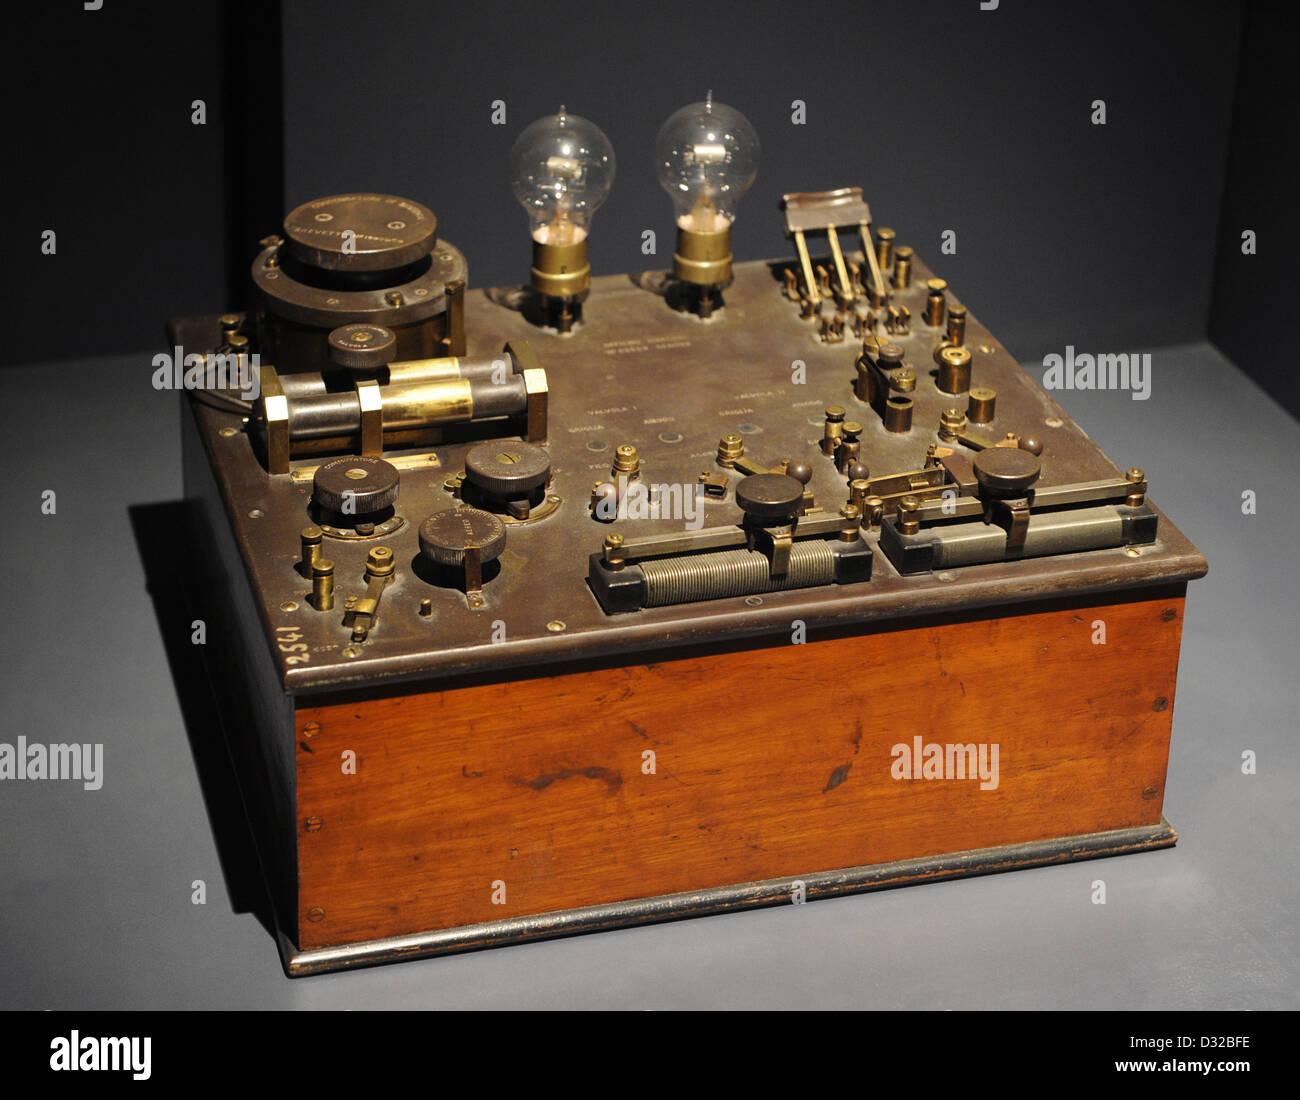 Two-valve radio-receiver. 1917. Officine Marconi, Genova. National Museum of Science and Technology Leonardo Da - Stock Image